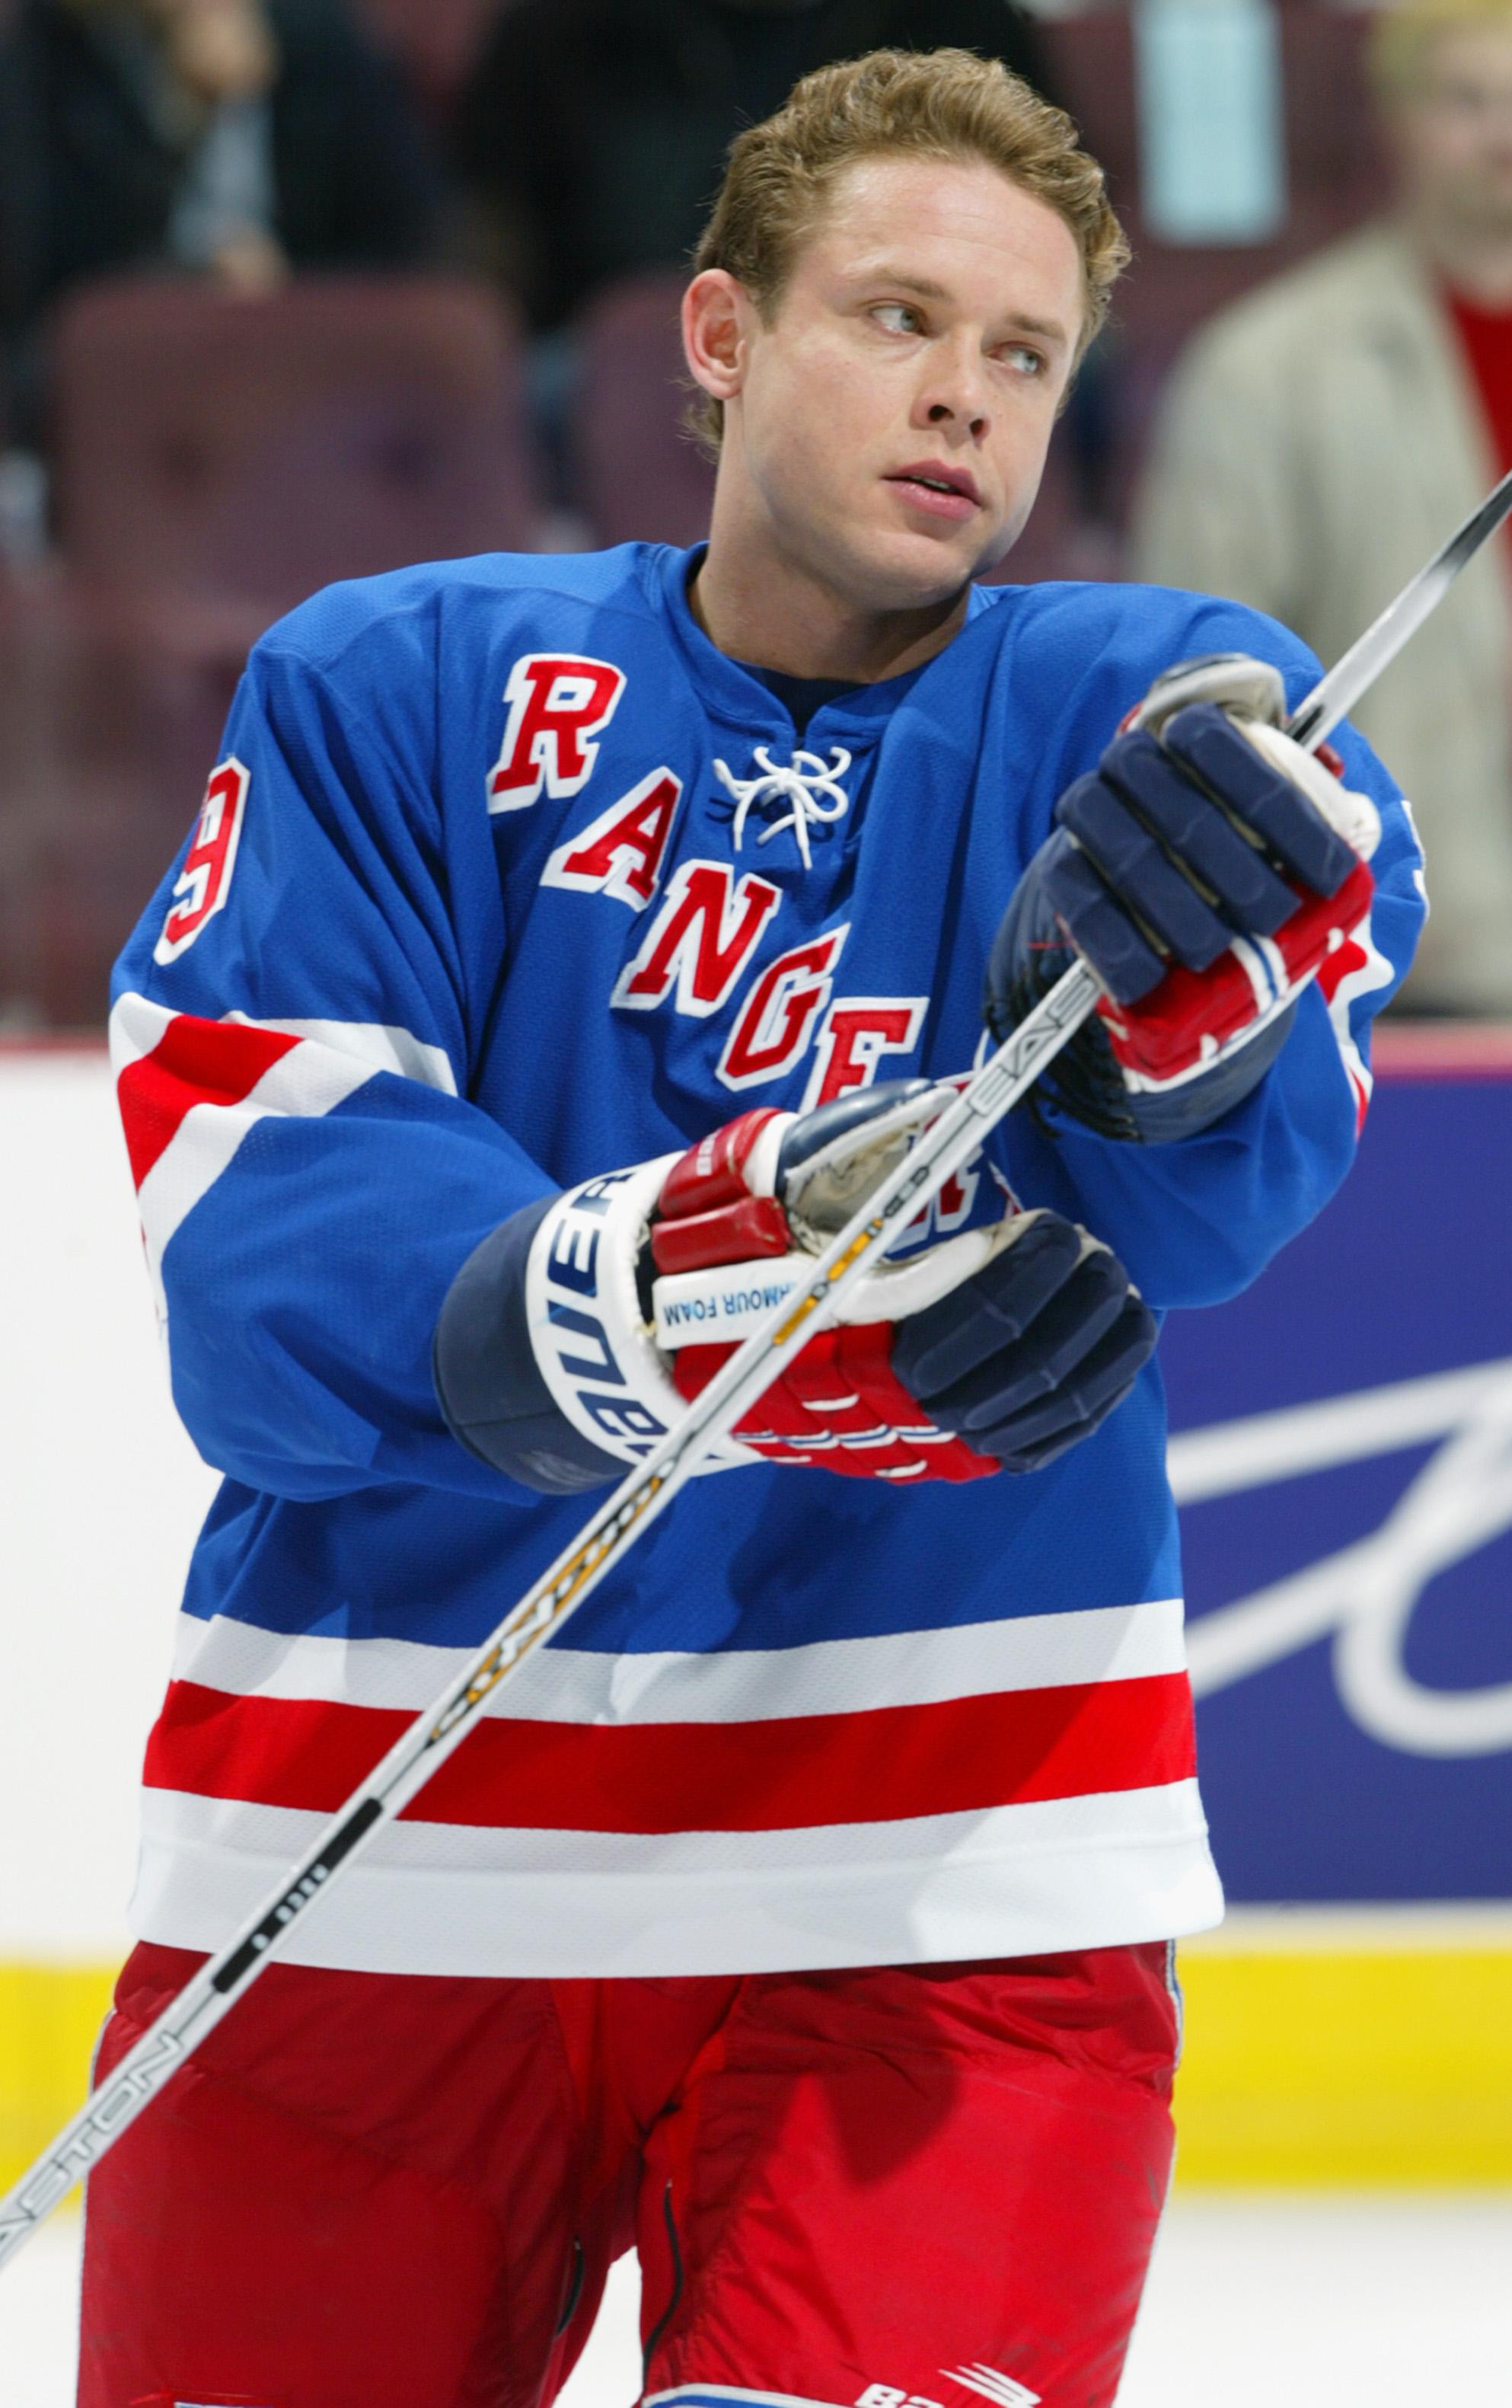 Фото:Jeff Vinnick/Getty Images/NHLI